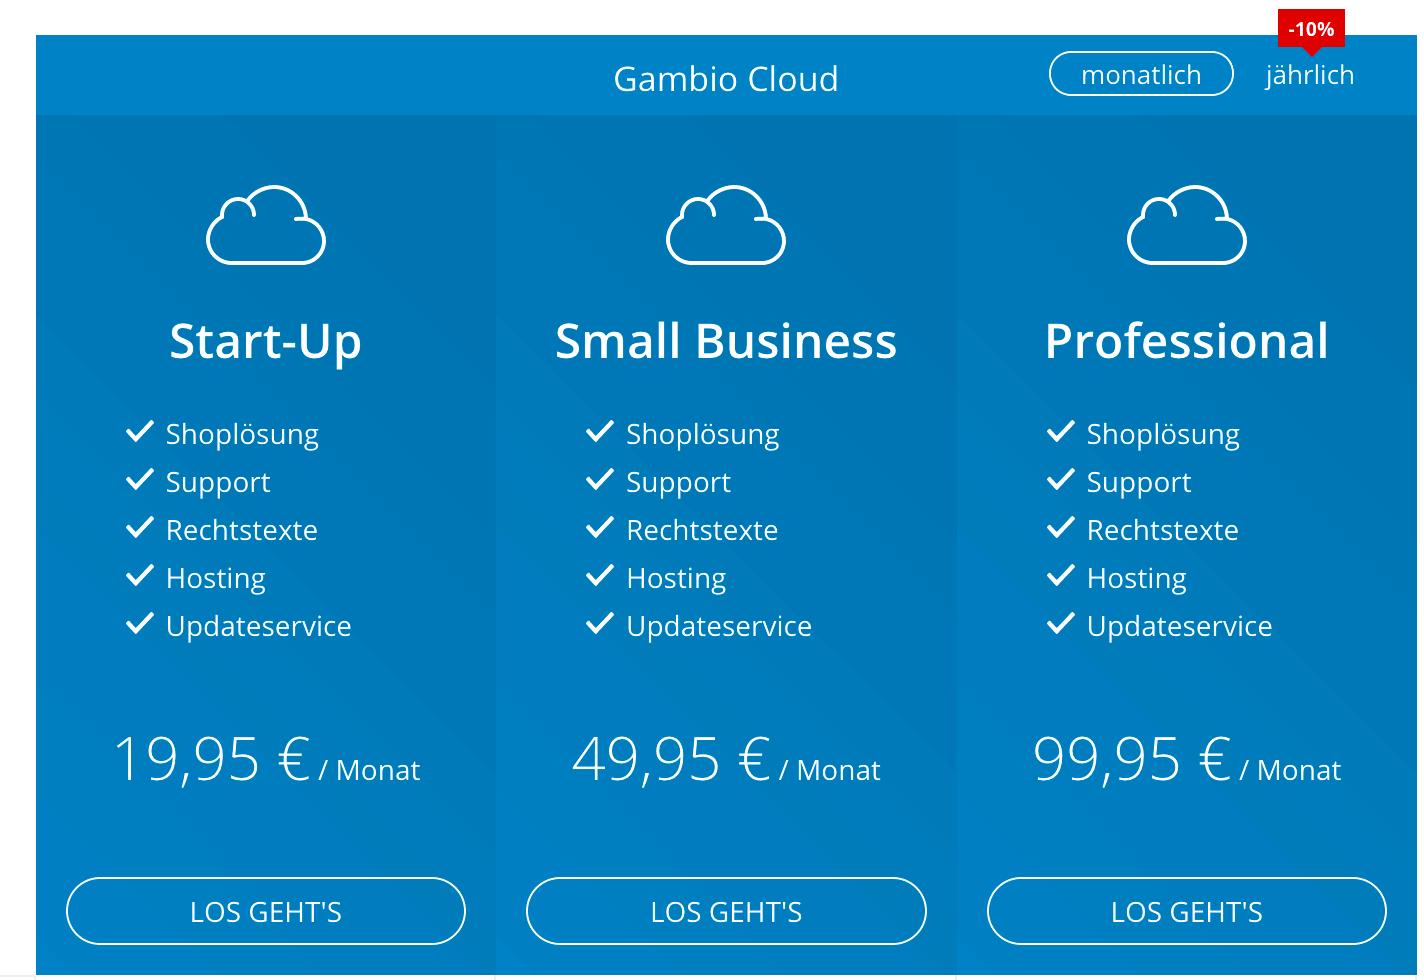 Gambio Cloud Preise